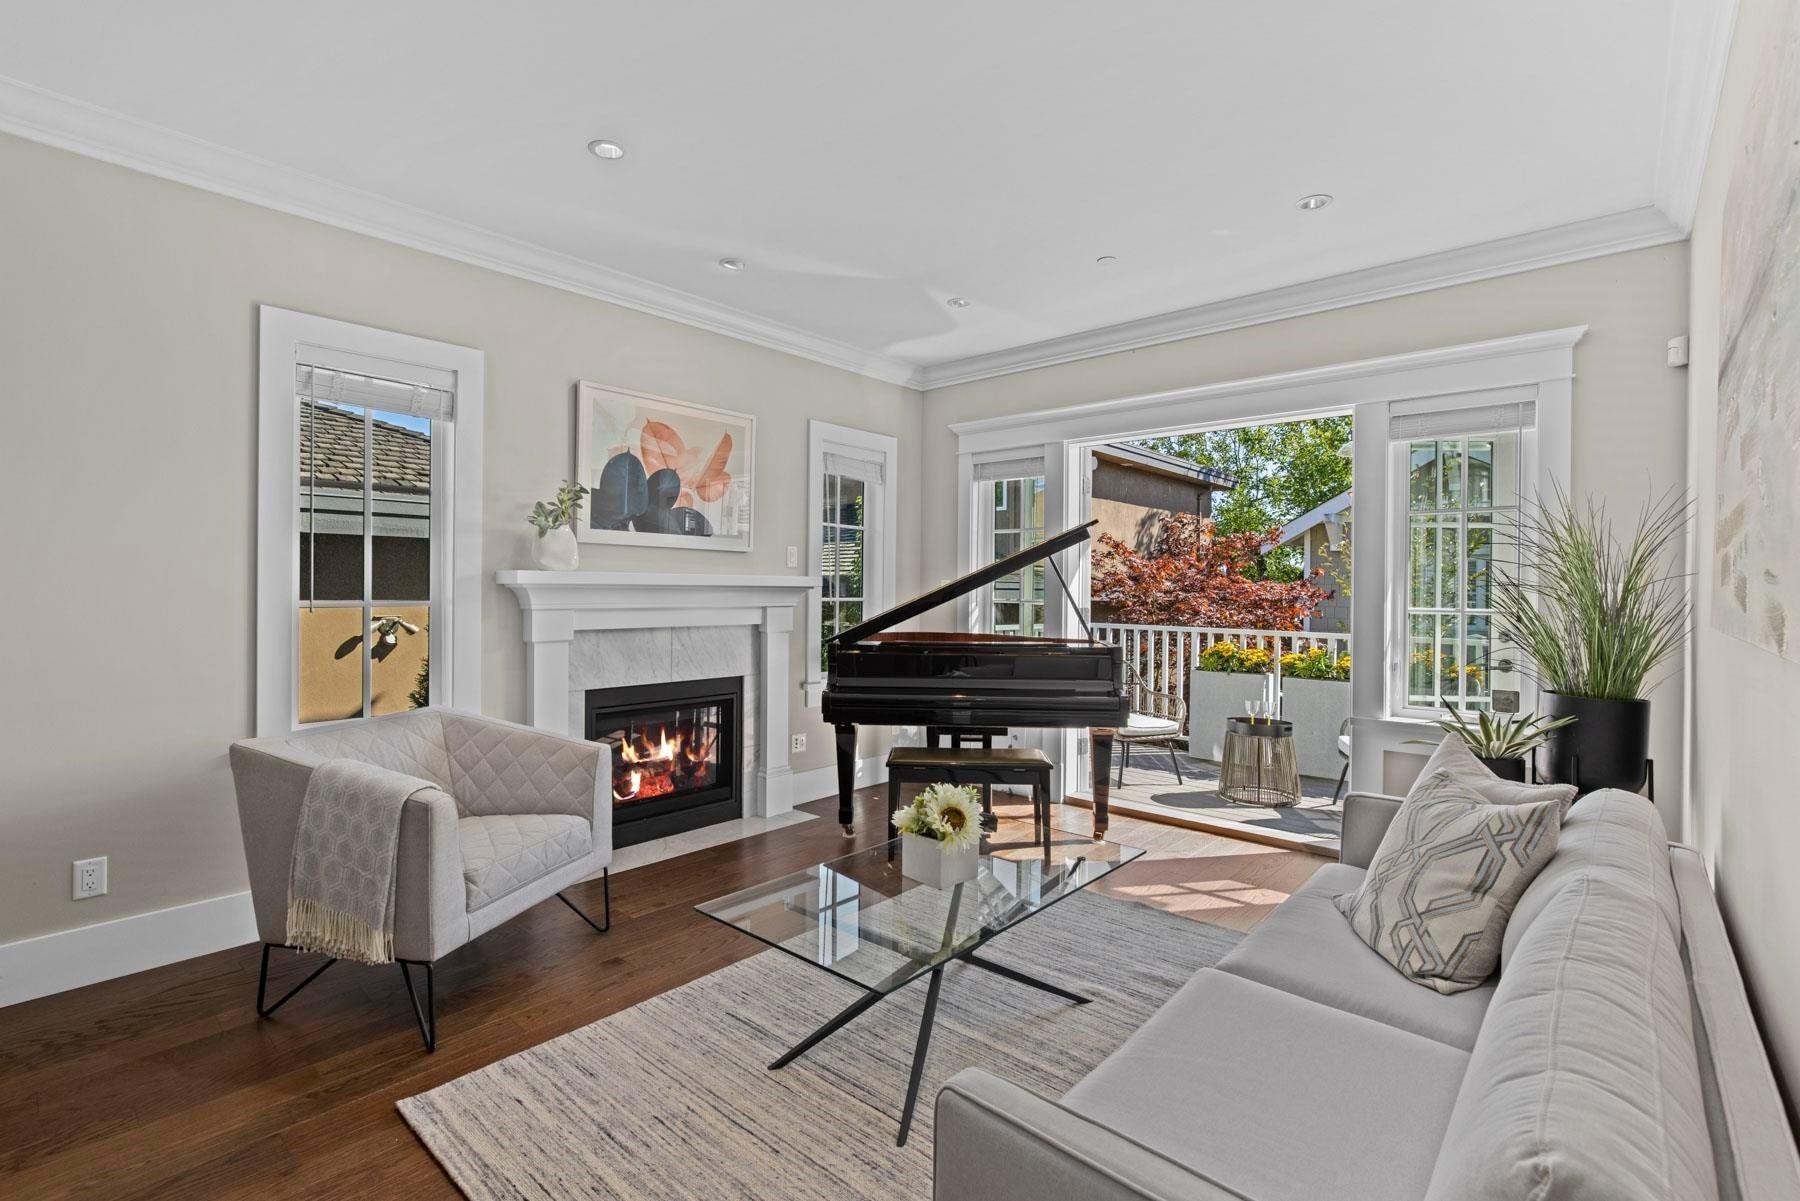 1421 GORDON AVENUE - Ambleside House/Single Family for sale, 3 Bedrooms (R2617756) - #5